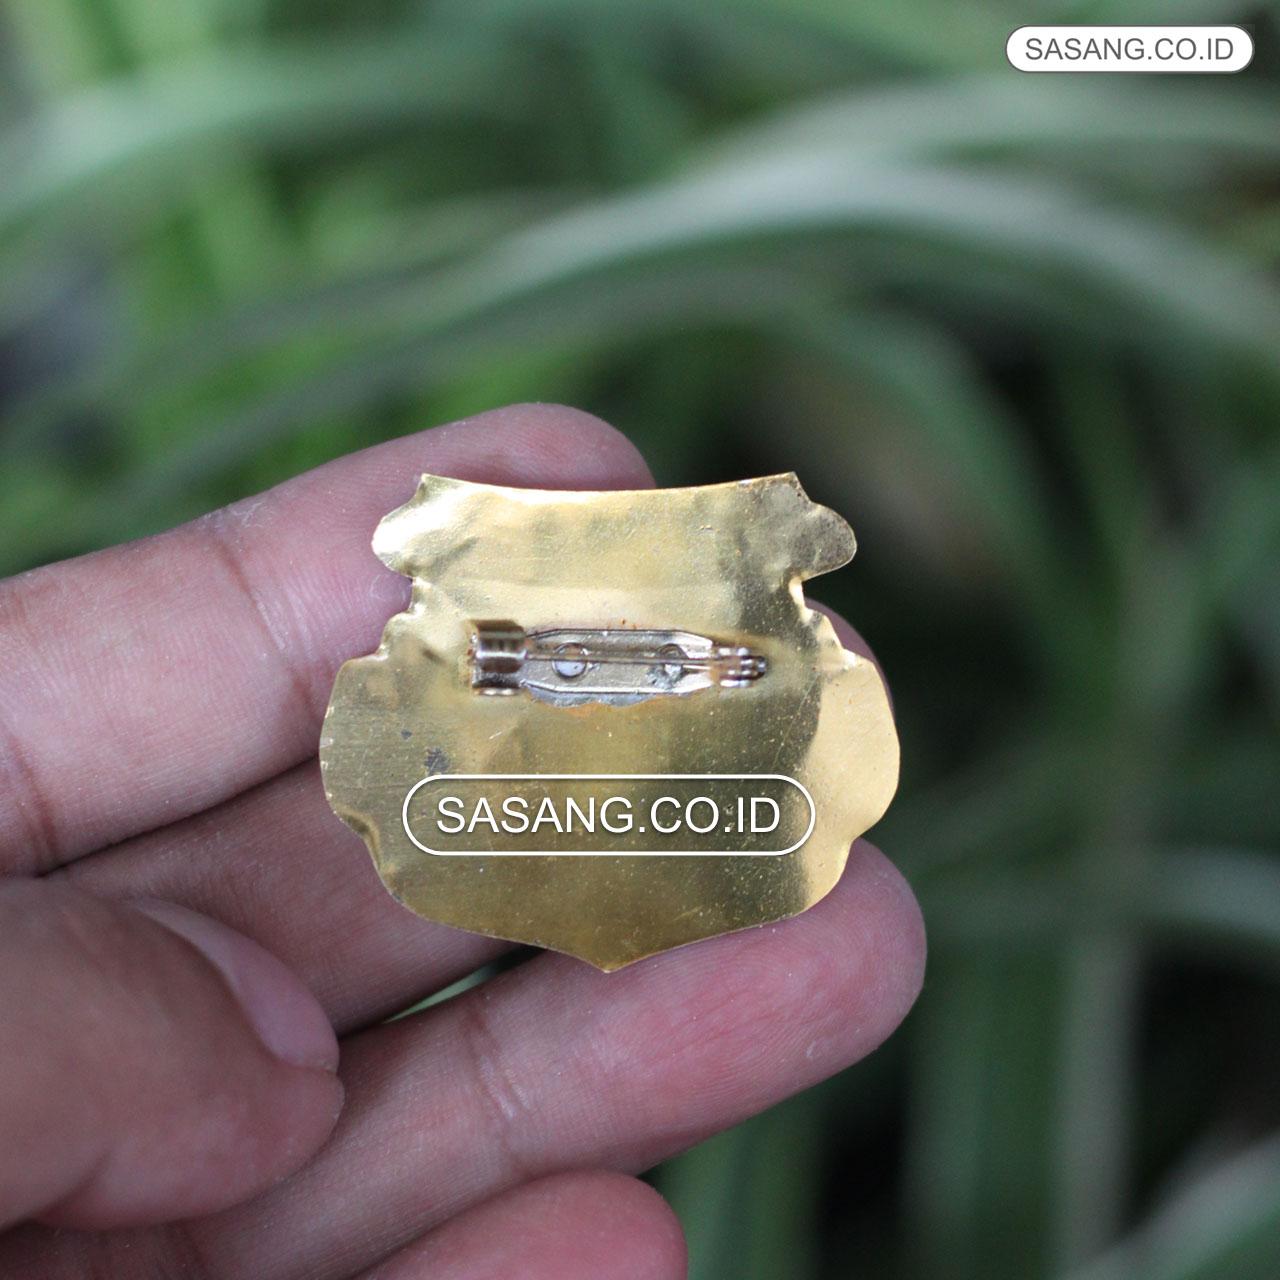 Lencana Gada Pratama Fiber Security Gp03fbjm Untuk Satpam - Daftar ... 7781beff98